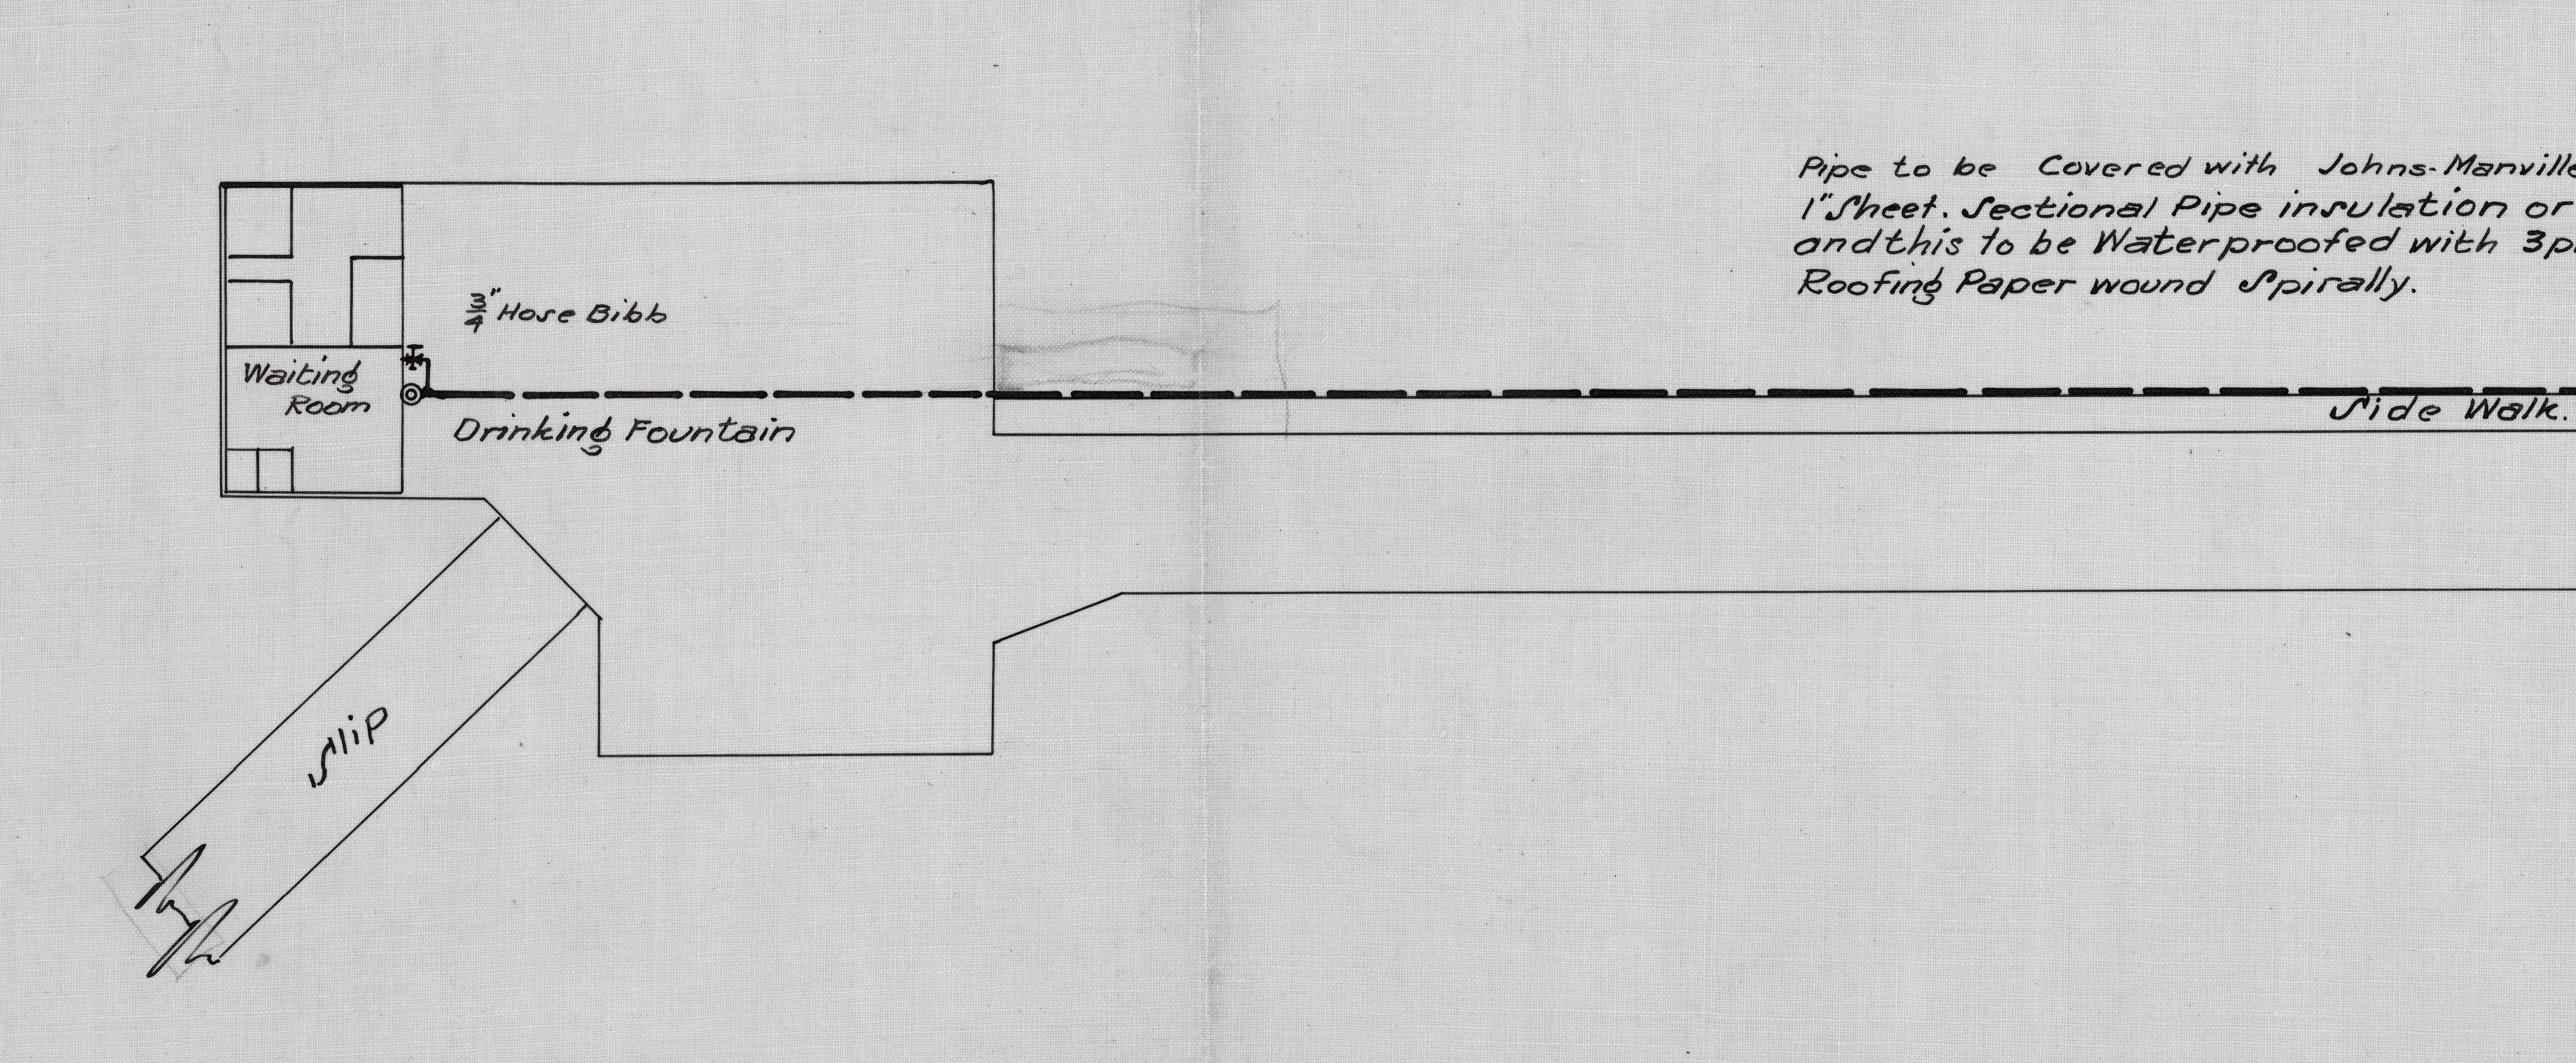 375-8-8_VashonHeights_DrinkingWater_Detail